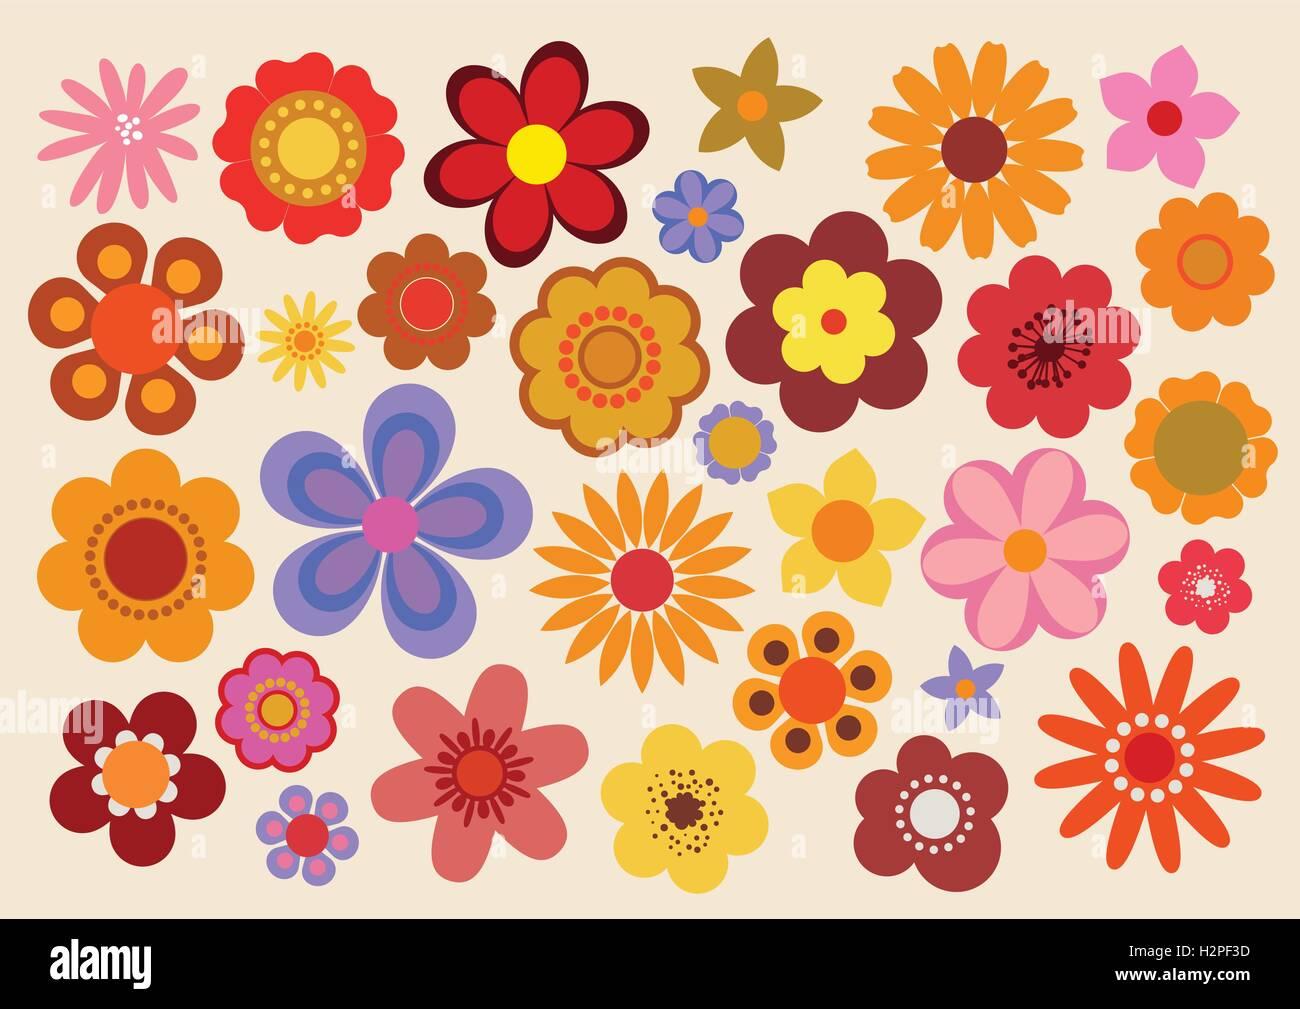 Vintage Flowers 60s/70s - Stock Image